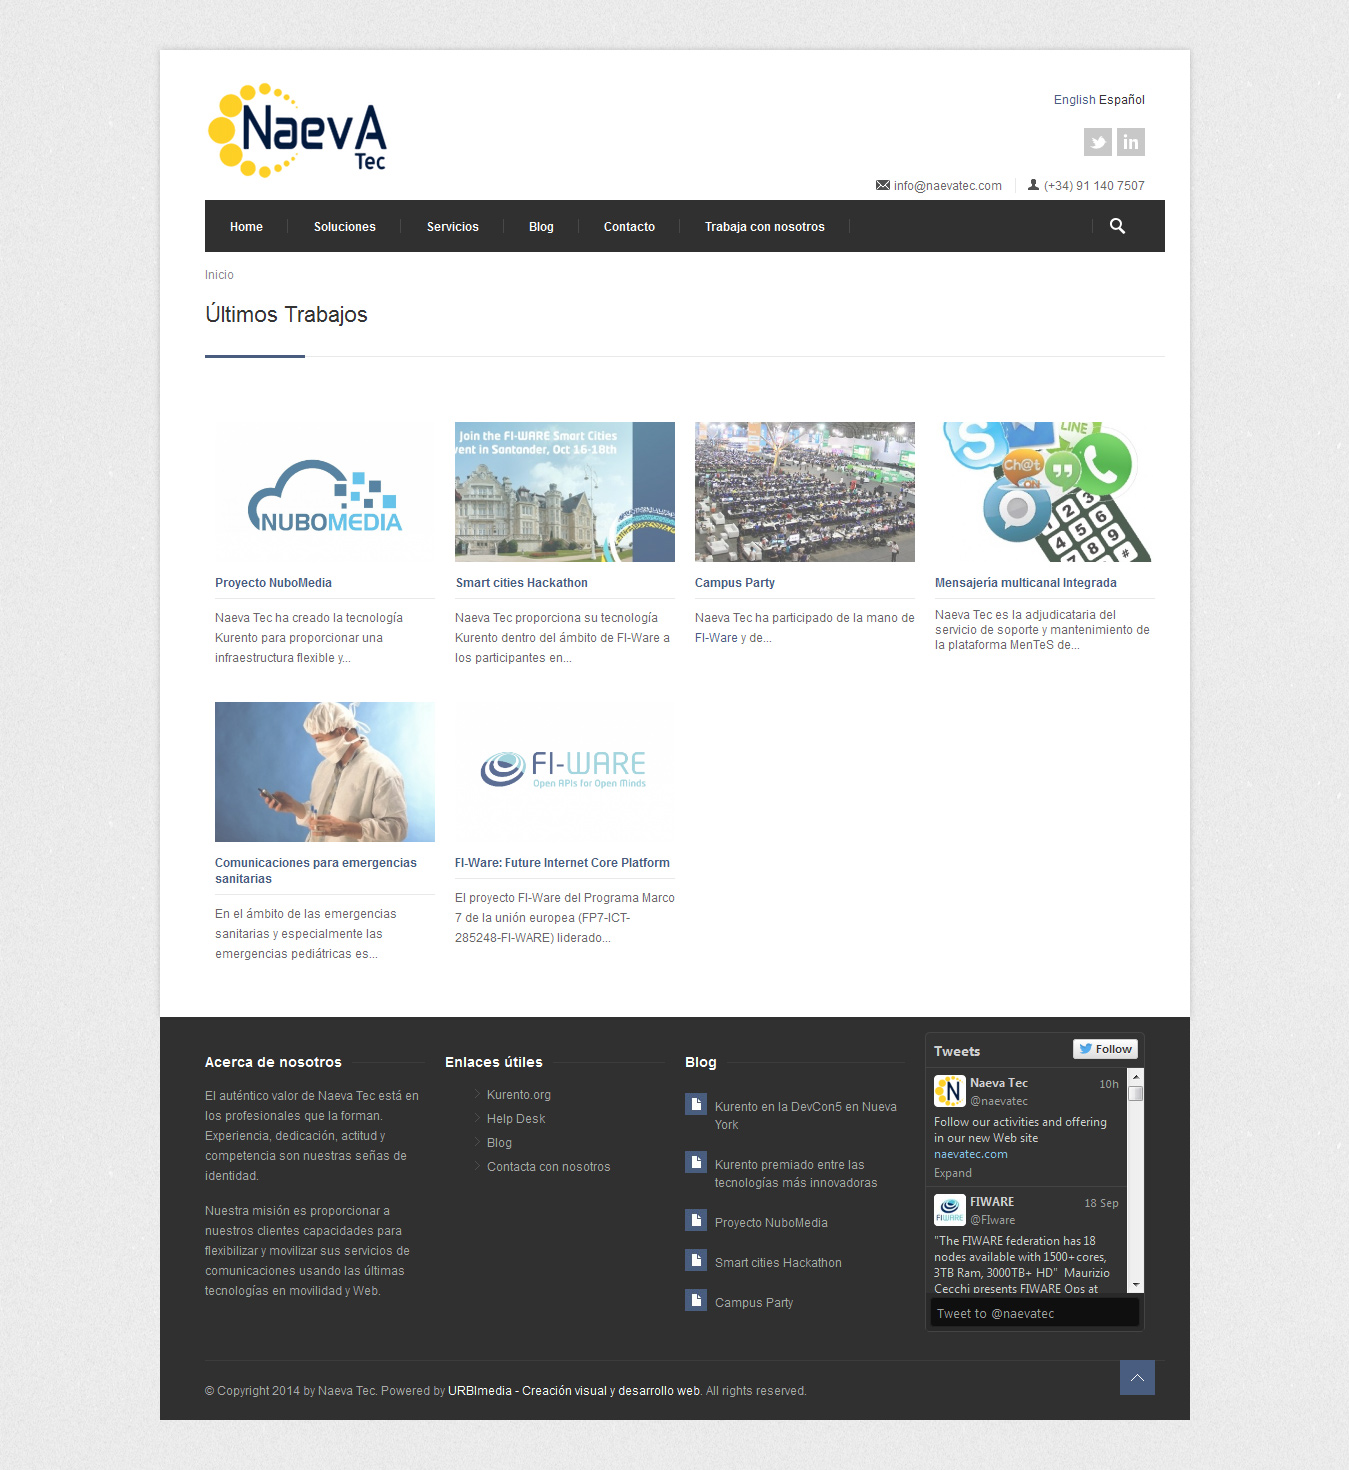 Naevatec - Trabajos